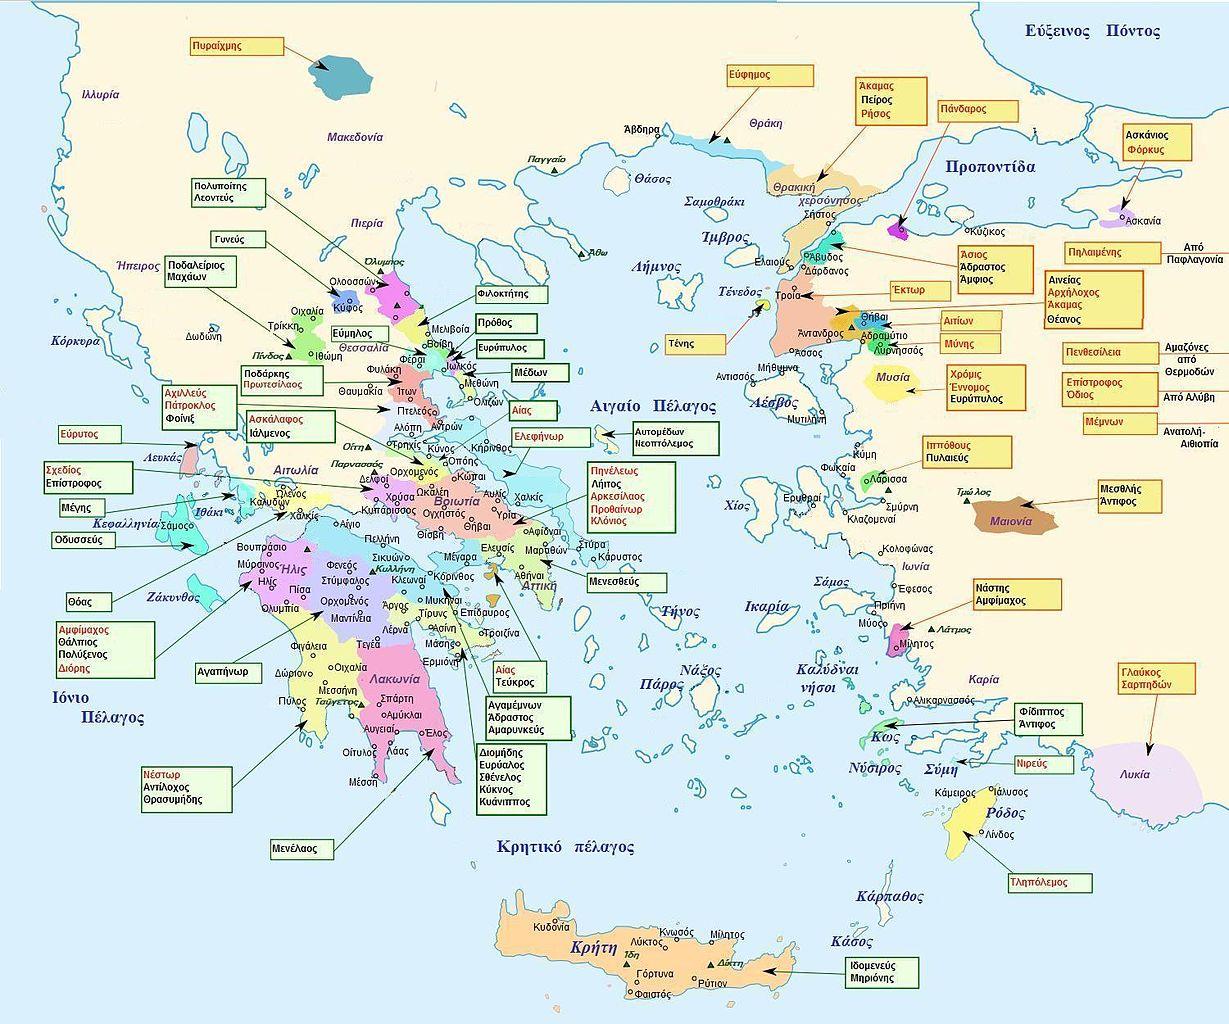 http://upload.wikimedia.org/wikipedia/commons/thumb/3/31/Homeric_Greece_el.jpg/1229px-Homeric_Greece_el.jpg